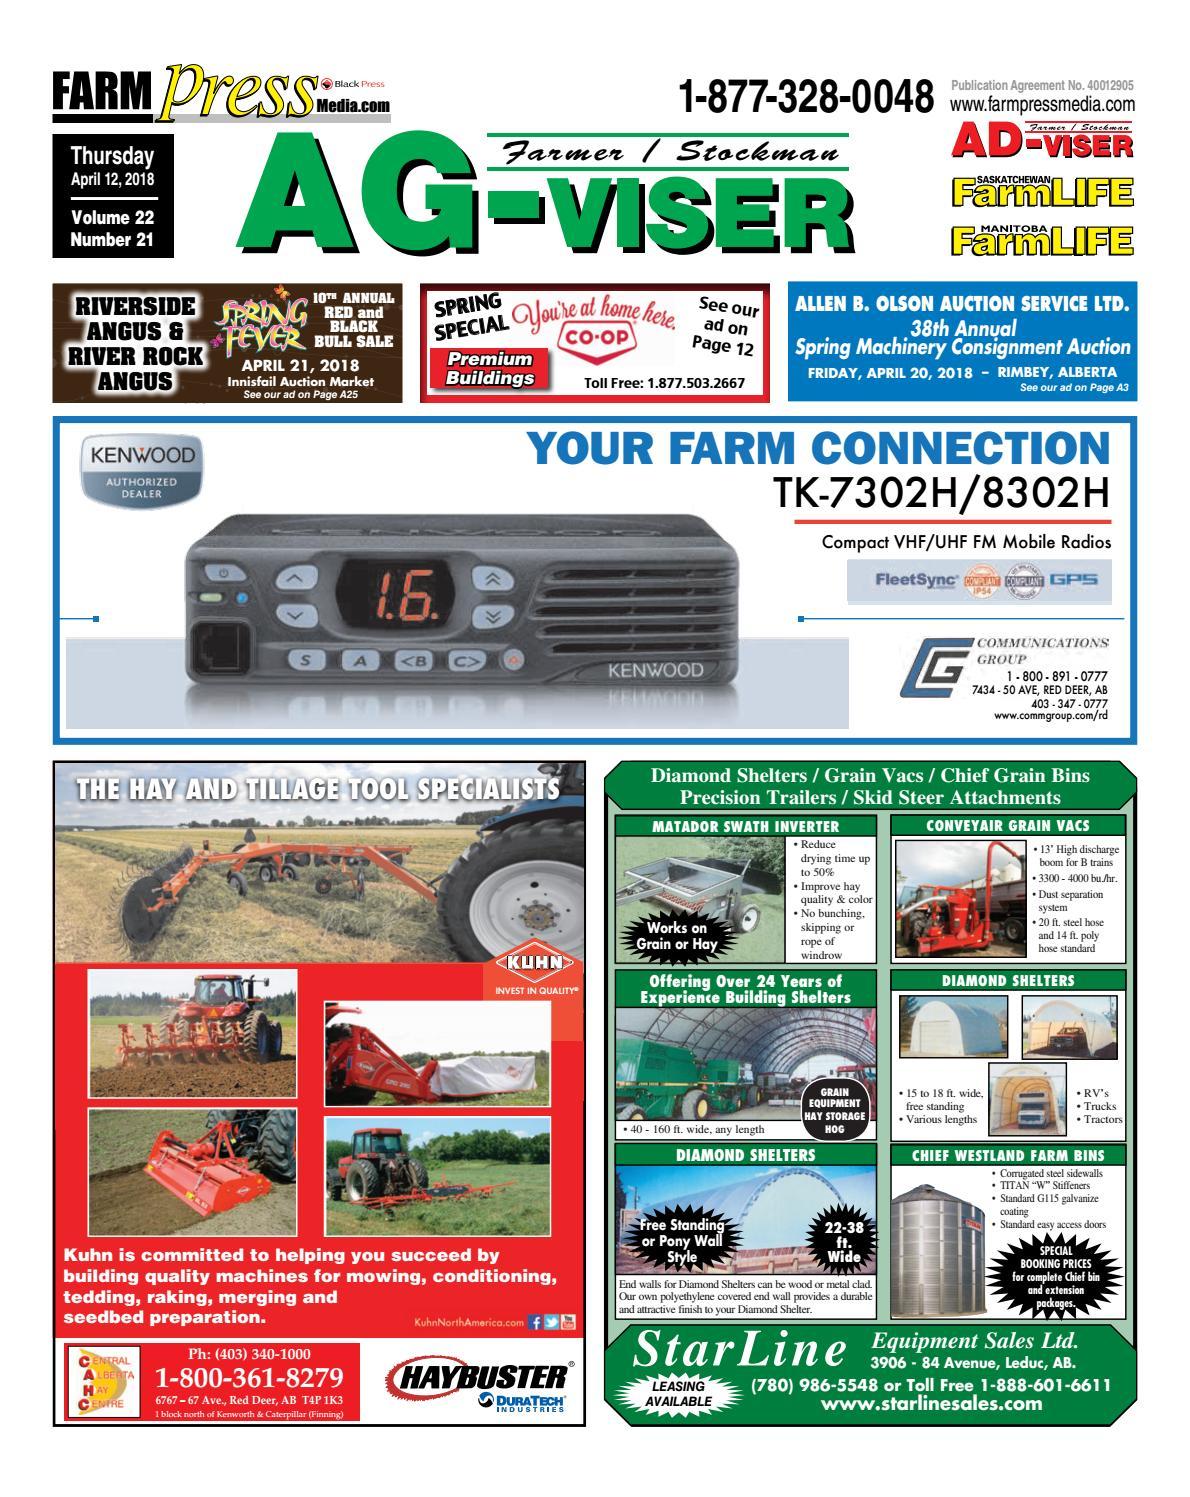 32e37b49e Northern Alberta Agvisor, April 12, 2018 by Black Press Media Group - issuu